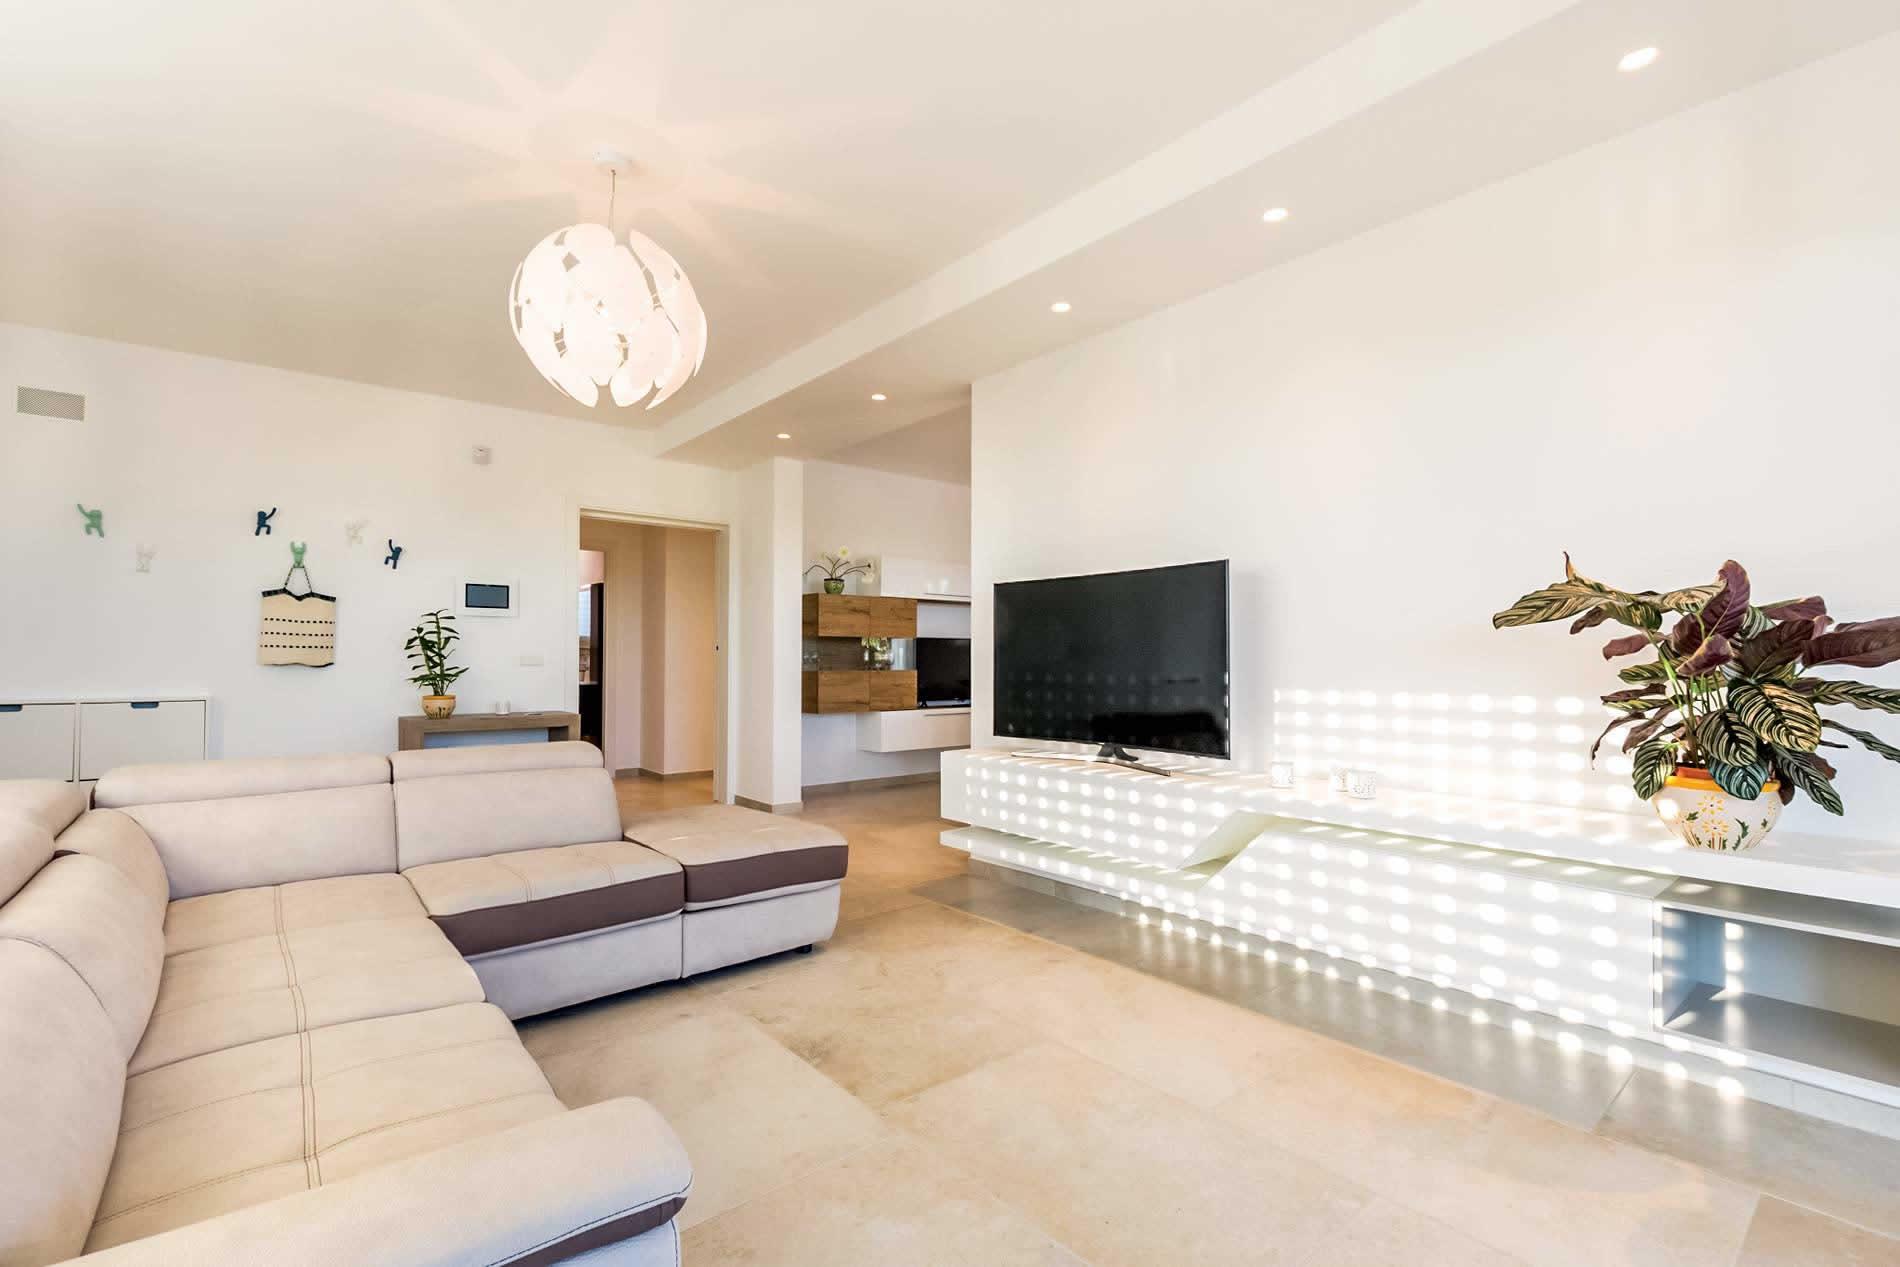 Villa Casa Moderna in Province of Lecce - sleeps 8 people